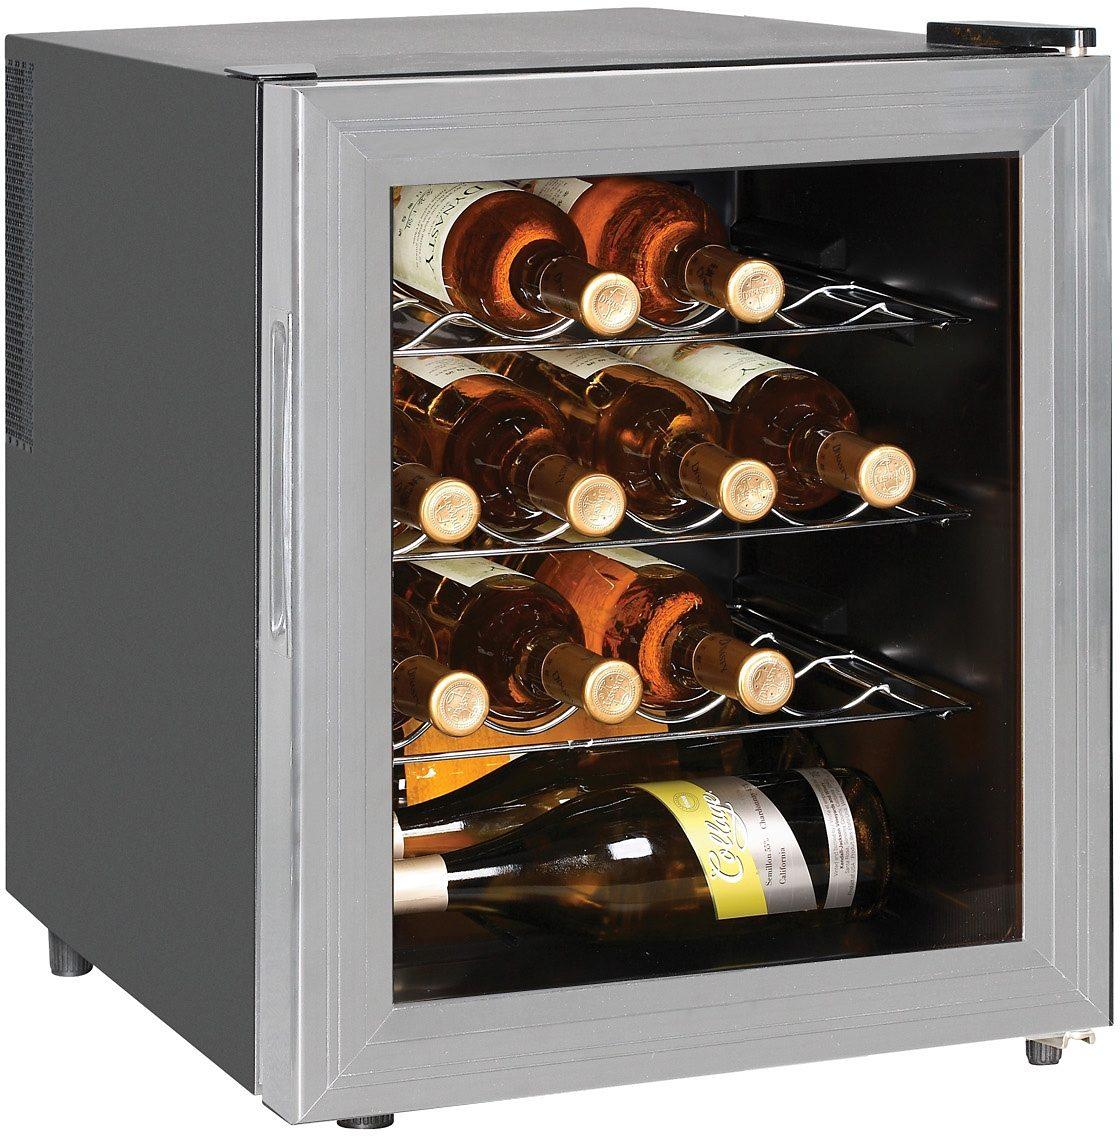 Silva Homeline Thermoelektrischer Weinkühlschrank WKS48TE, Energieklasse B, 43 cm hoch